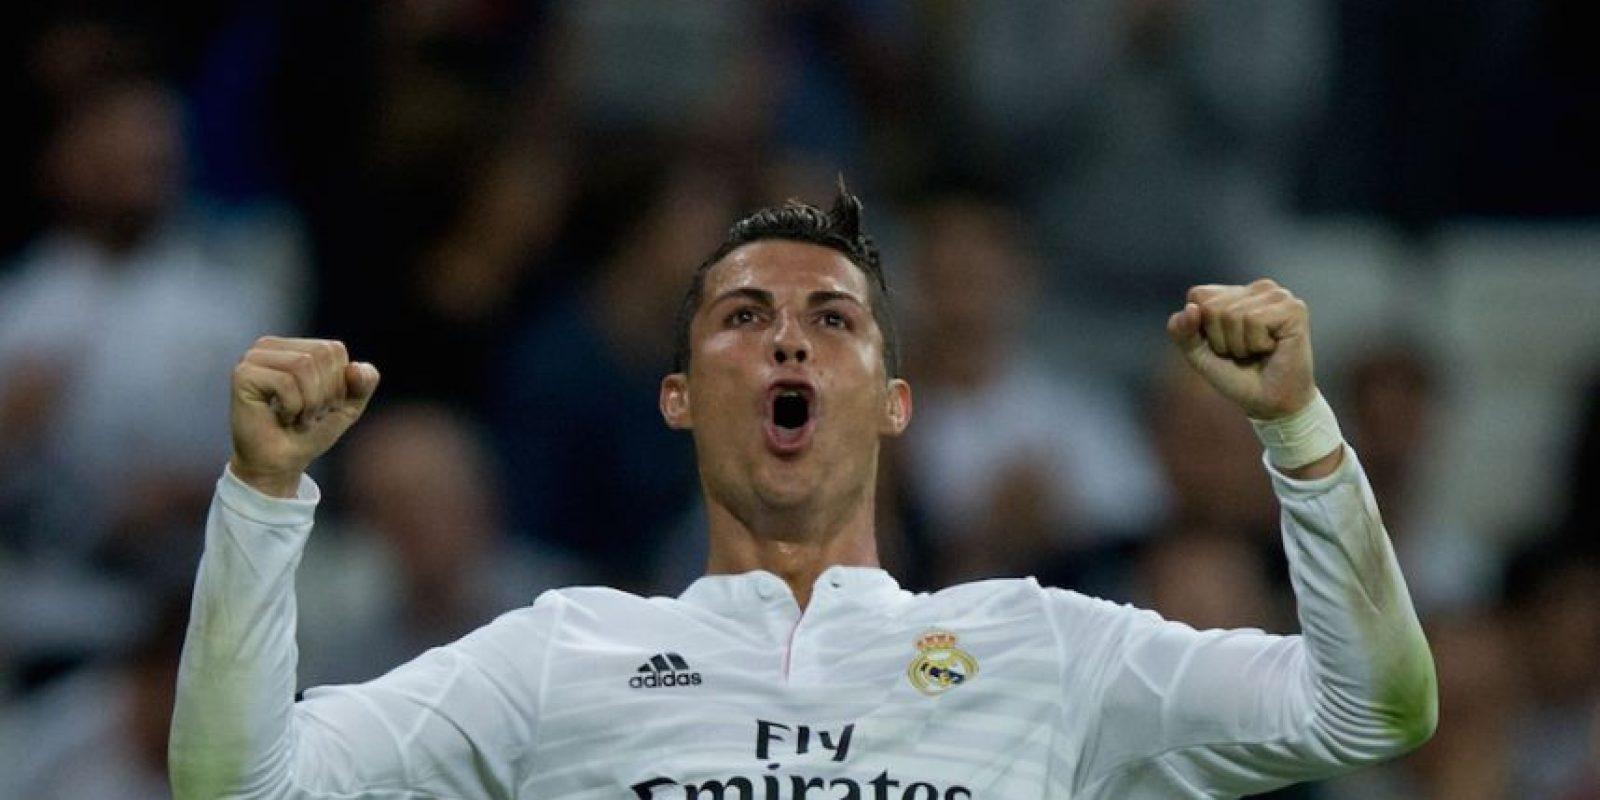 Carlo Ancelotti, técnico del Real Madrid, confirmó que Cristiano Ronaldo será titular. Foto:Getty Images